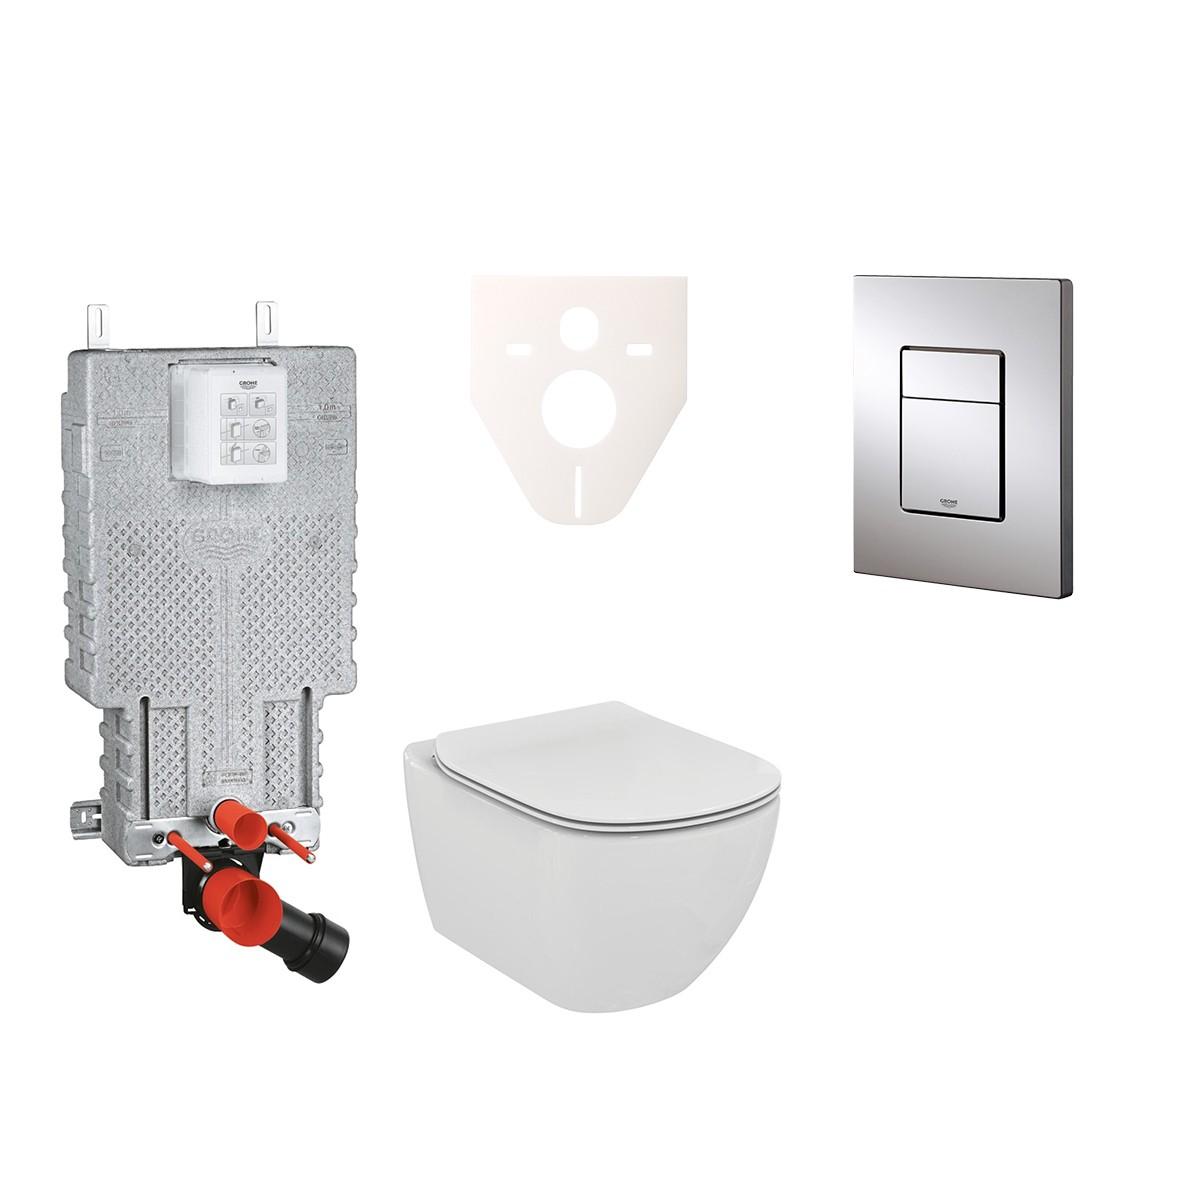 Závěsný set WC TESI Rimless + modul Grohe Uniset s tlačítkem Grohe Cosmo (chrom) 38643SET-KE